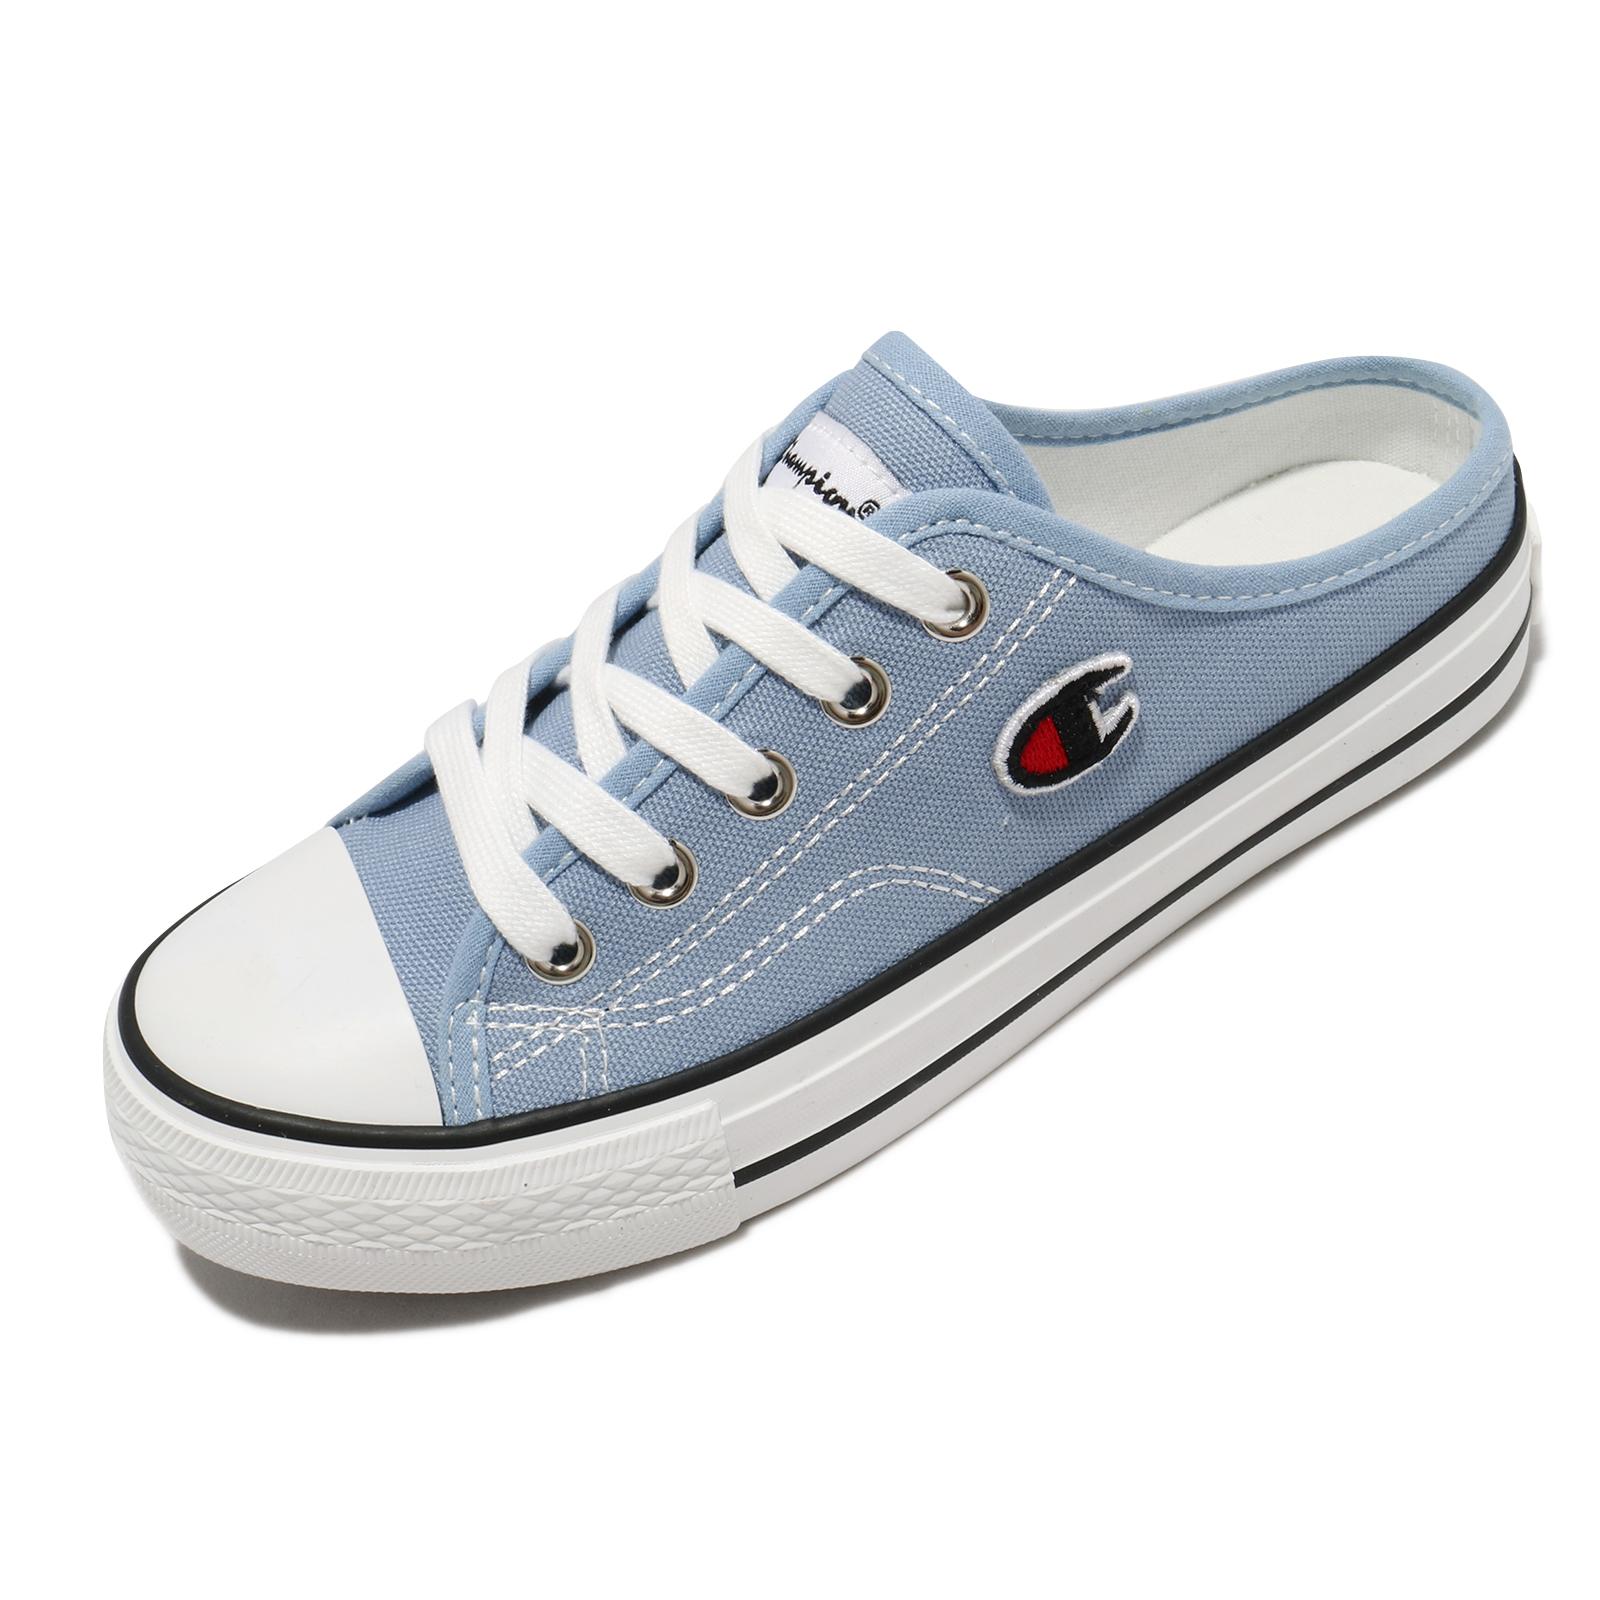 Champion 穆勒鞋 Canvas Slip 帆布鞋 女 淺藍 基本款 休閒鞋【ACS】 WSLS101460